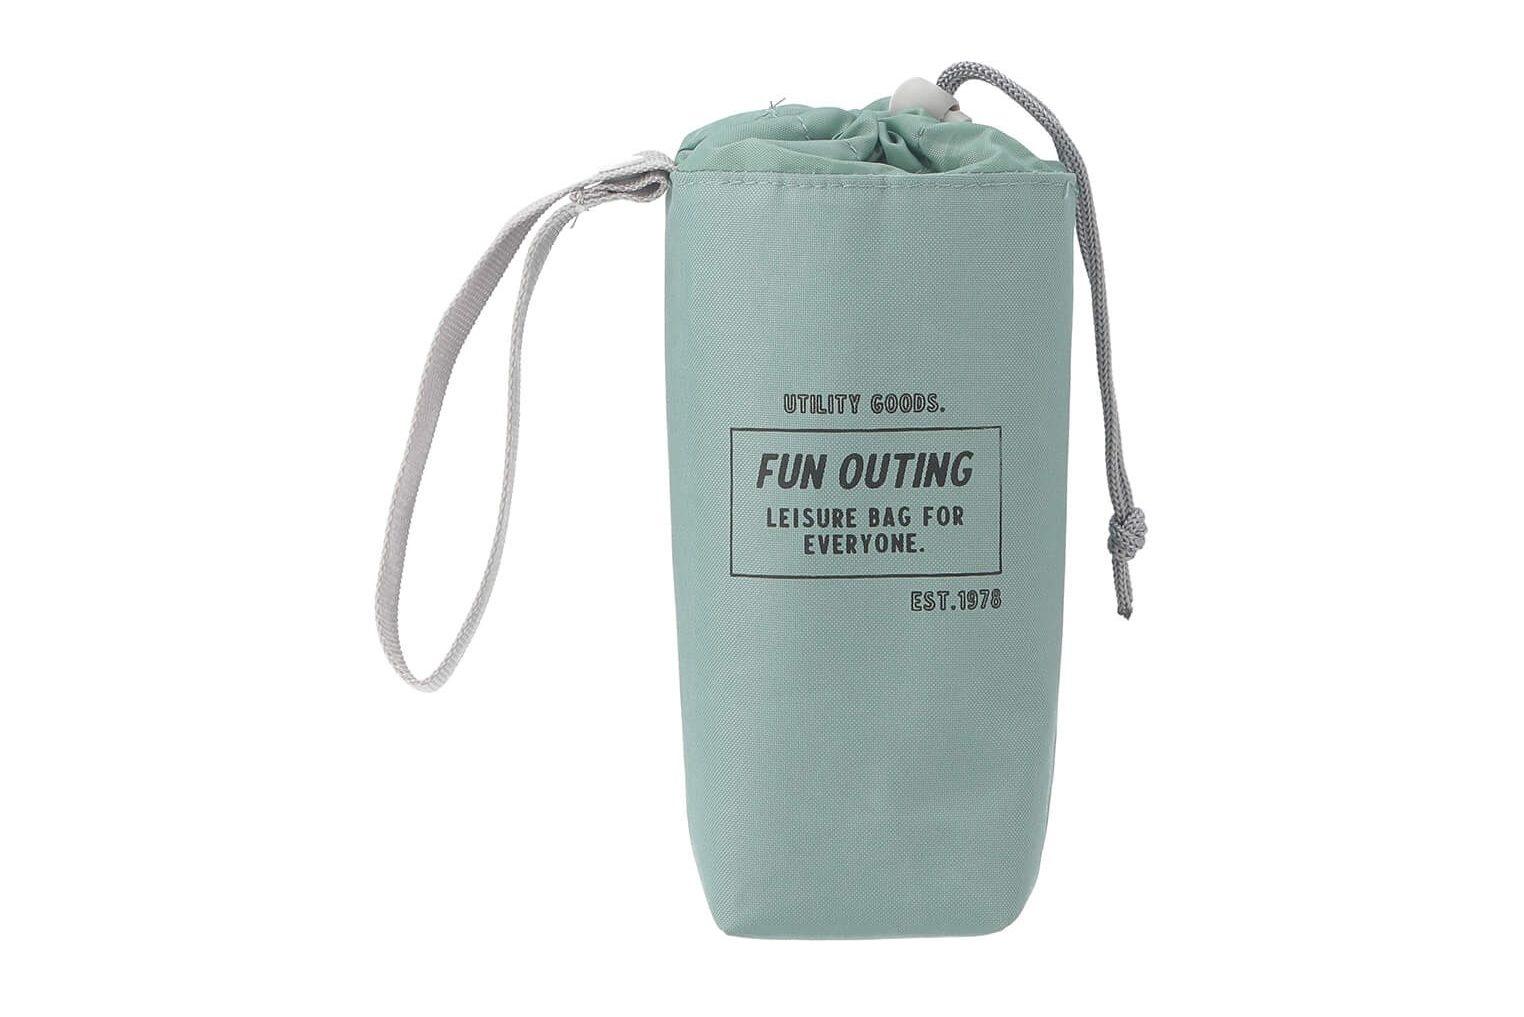 500mlまでのマグボトルやペットボトルの持ち運びに便利なケース